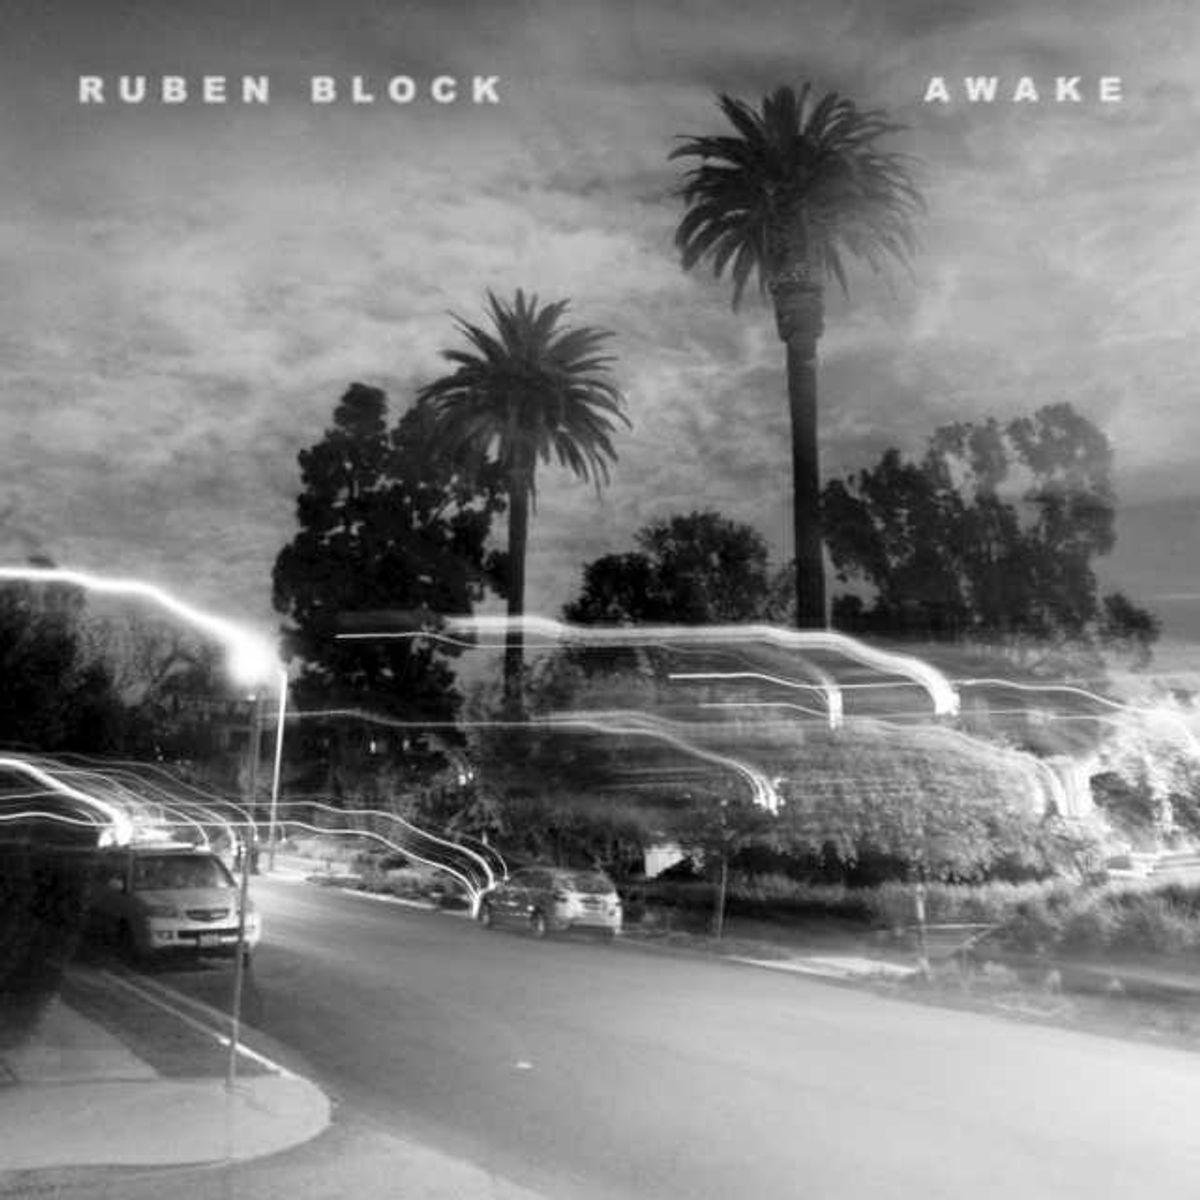 Ruben Block - Awake